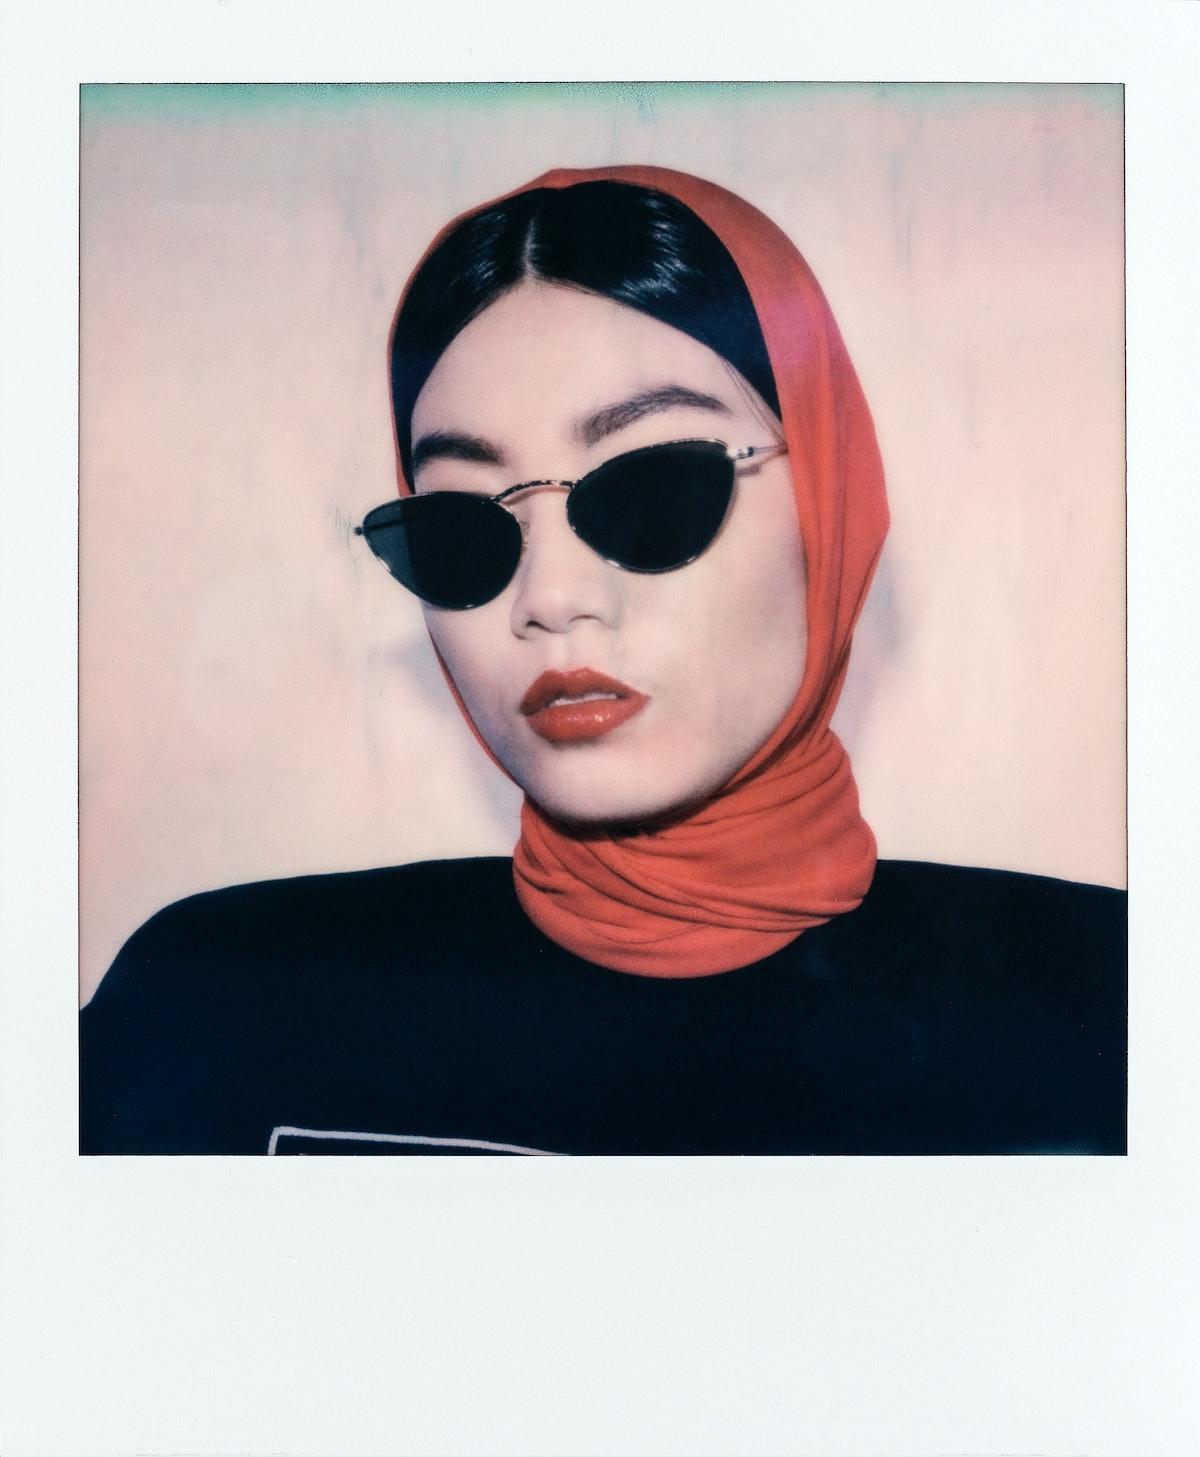 Versace hood and sweatshirt; Oliver Peoples sunglasses.